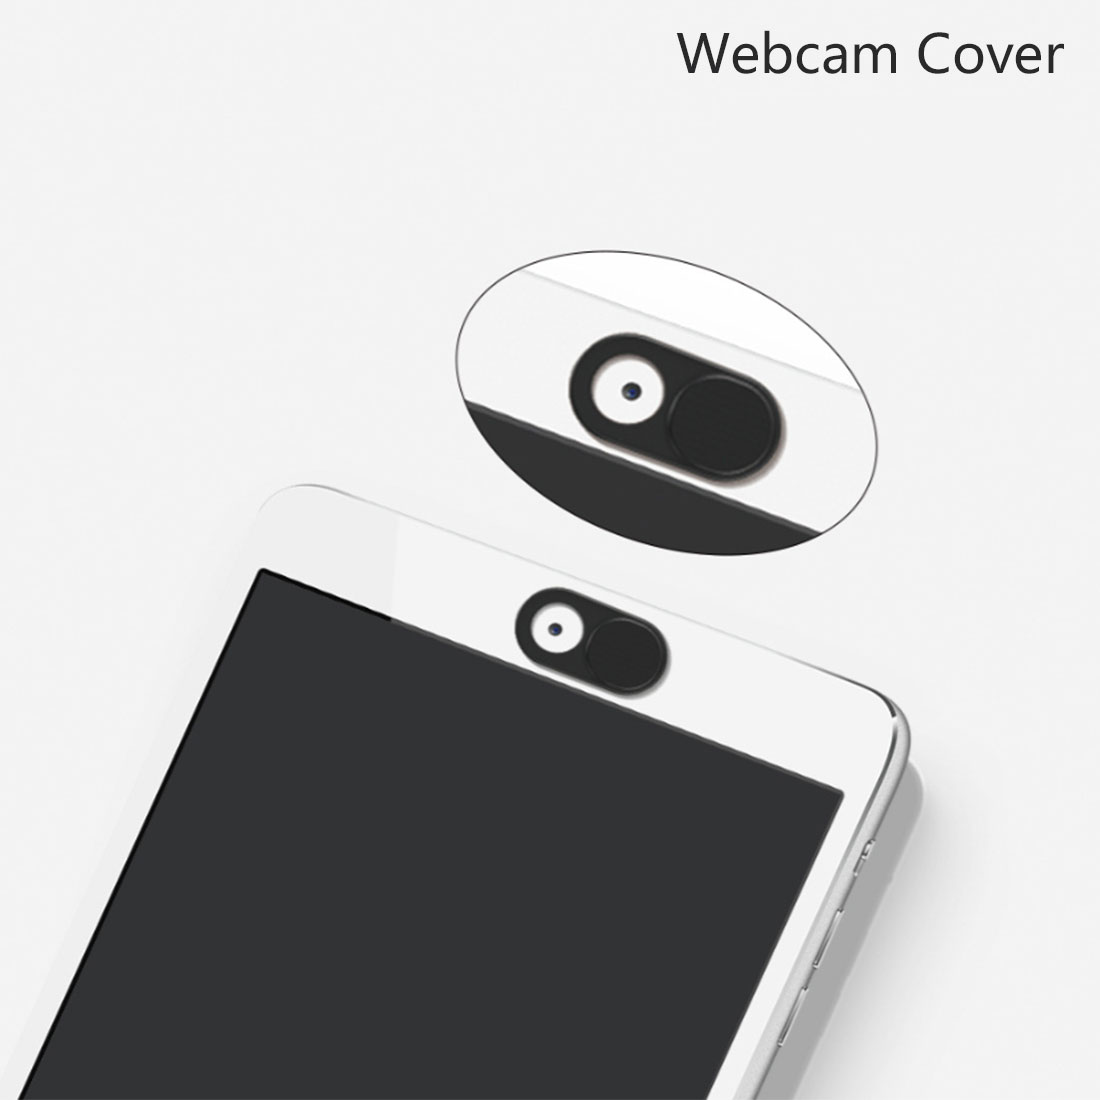 Etmakit 3Pcs Metal WebCam Shutter Cover Web Camera Secure